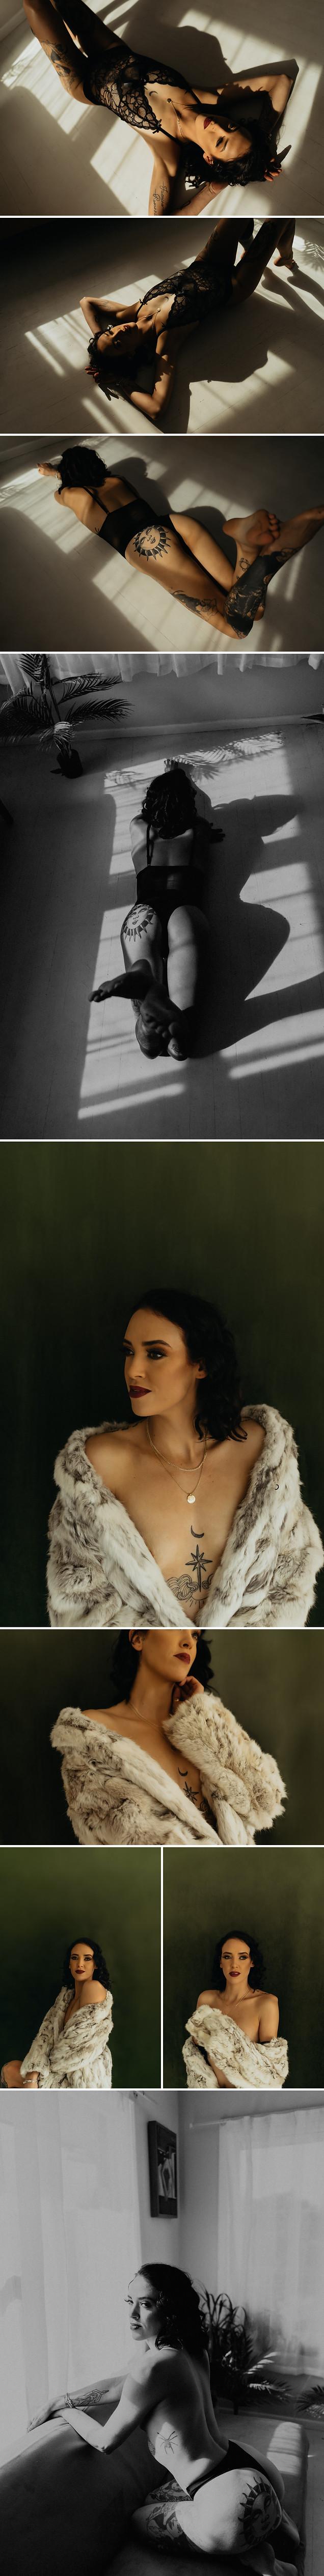 auckland boudoir, new zealand boudoir, woman photographer, female empowerment photography, boudoir photographer, boudoir photography, boudoir